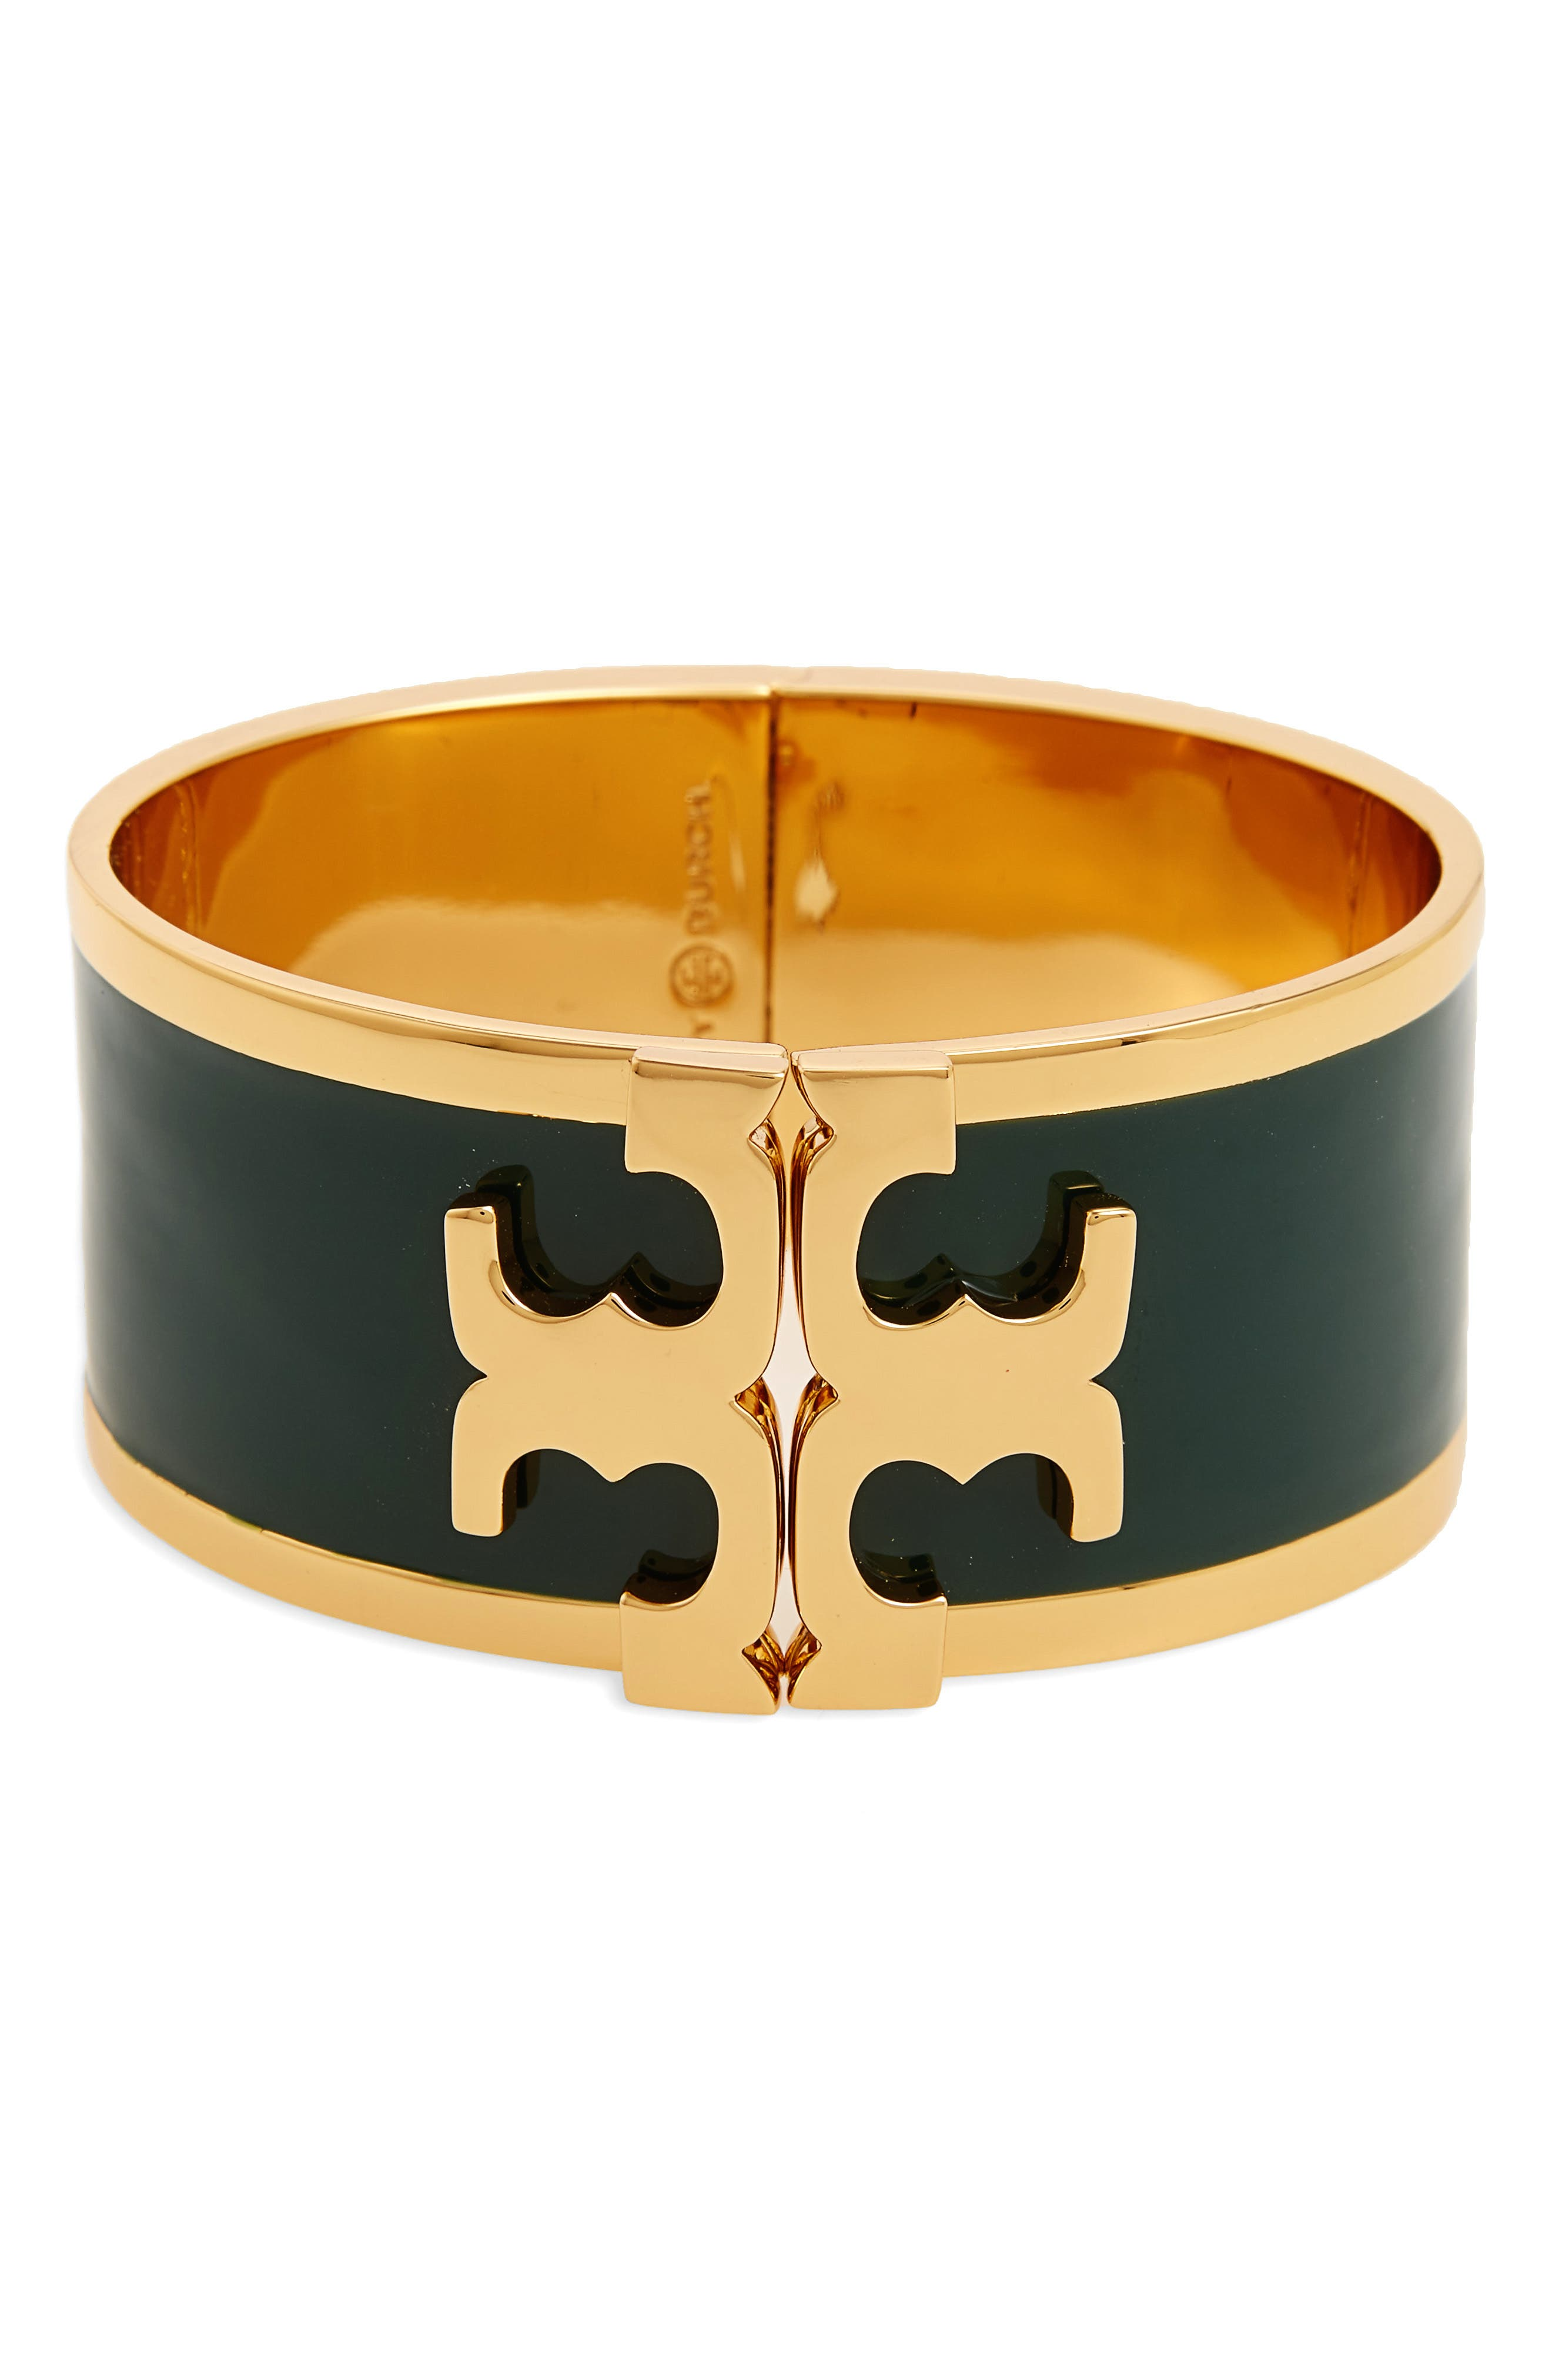 Main Image - Tory Burch Enamel Logo Bracelet